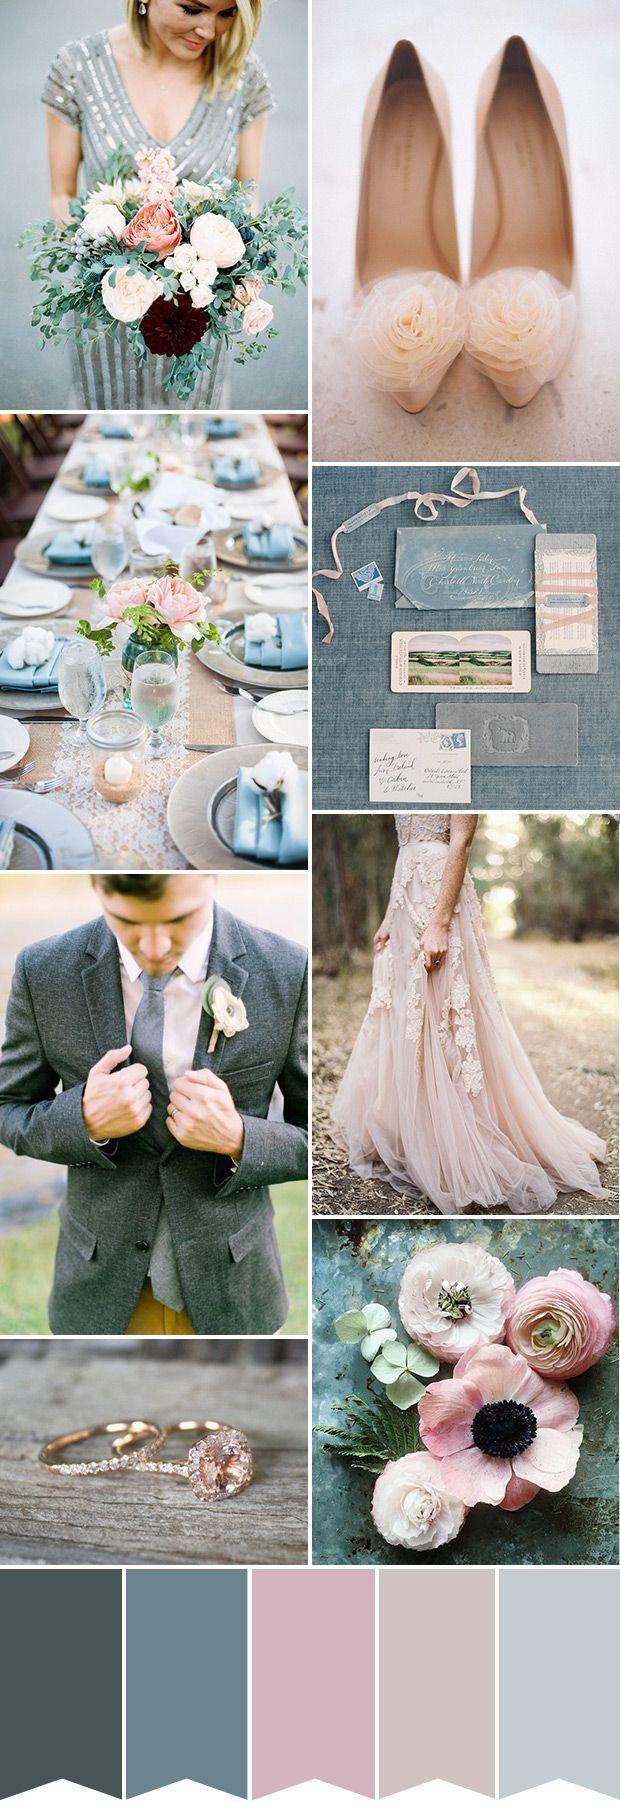 Vintage Wedding Colors | Vintage Wedding Colors Best Photos Vintage Wedding Wedding